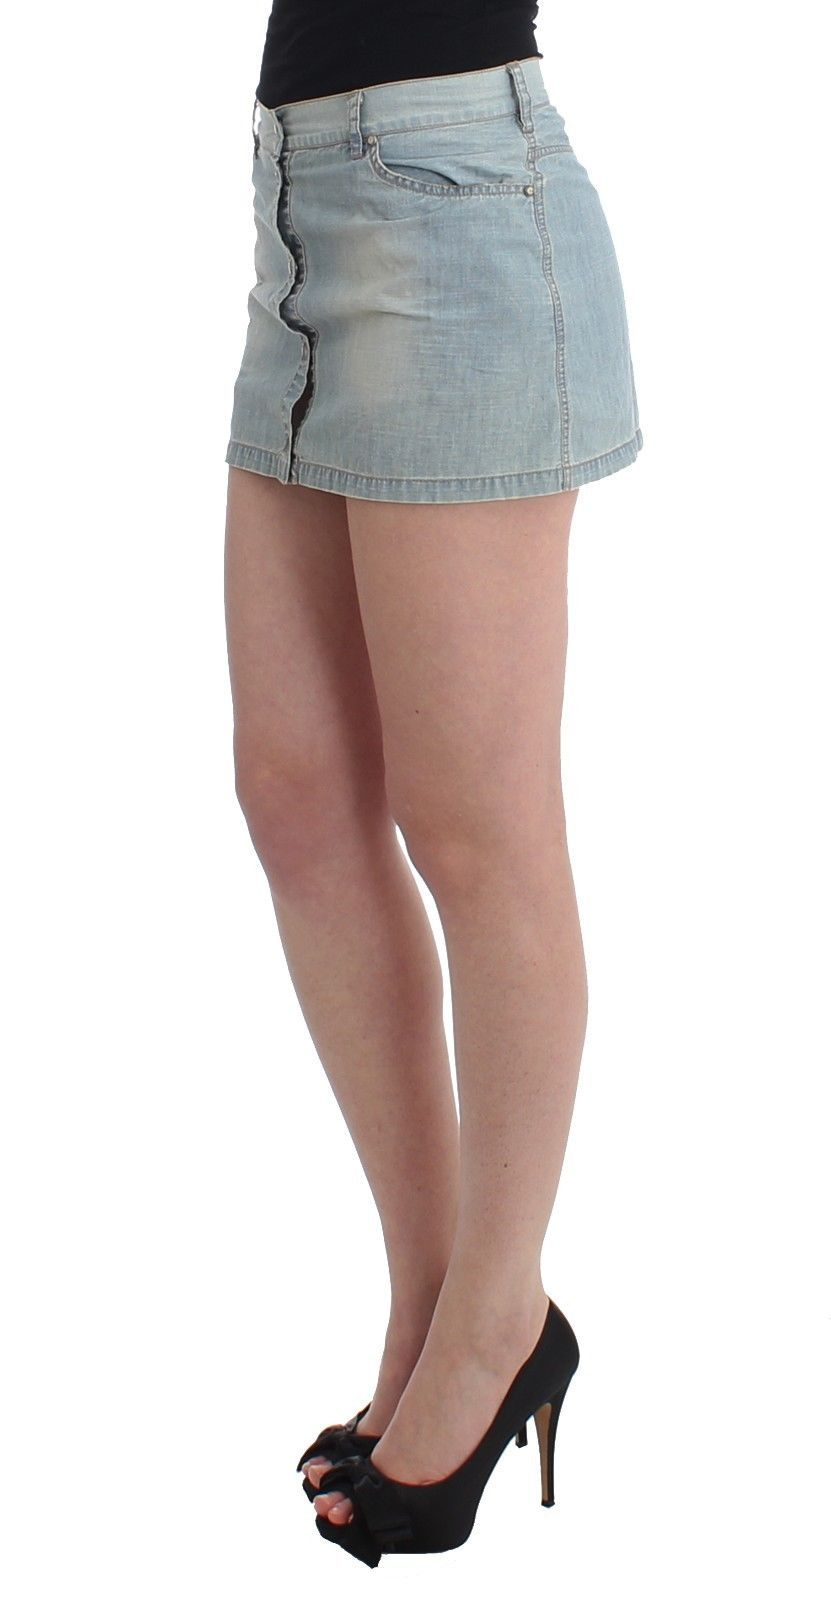 Ermanno Scervino Beachwear Blue Denim Mini Skirt A-Line